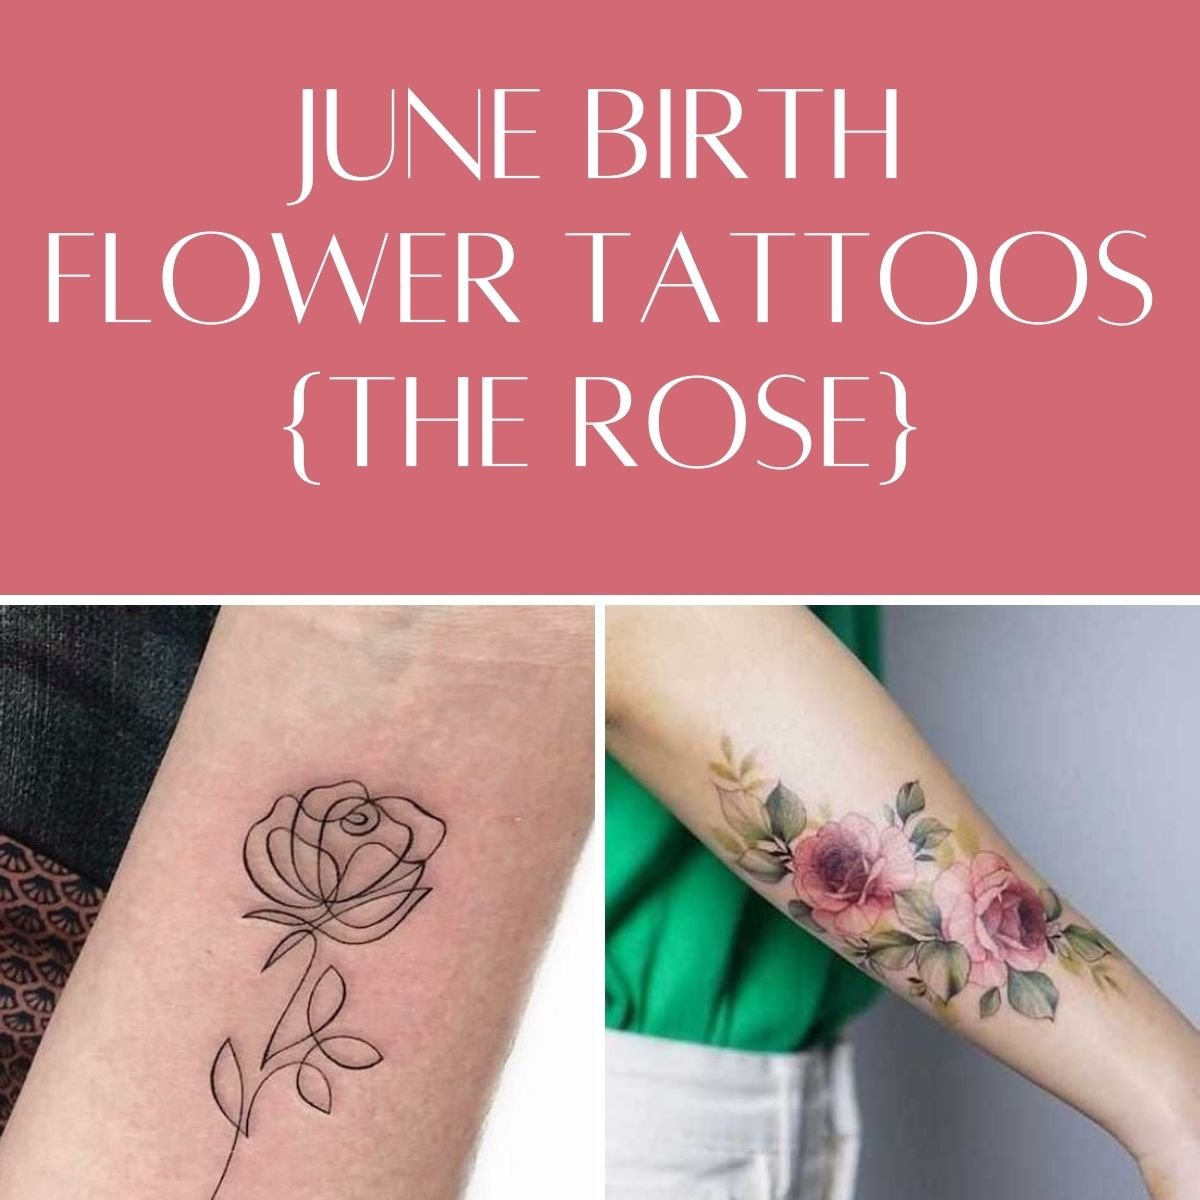 June Birth Flower Tattoos